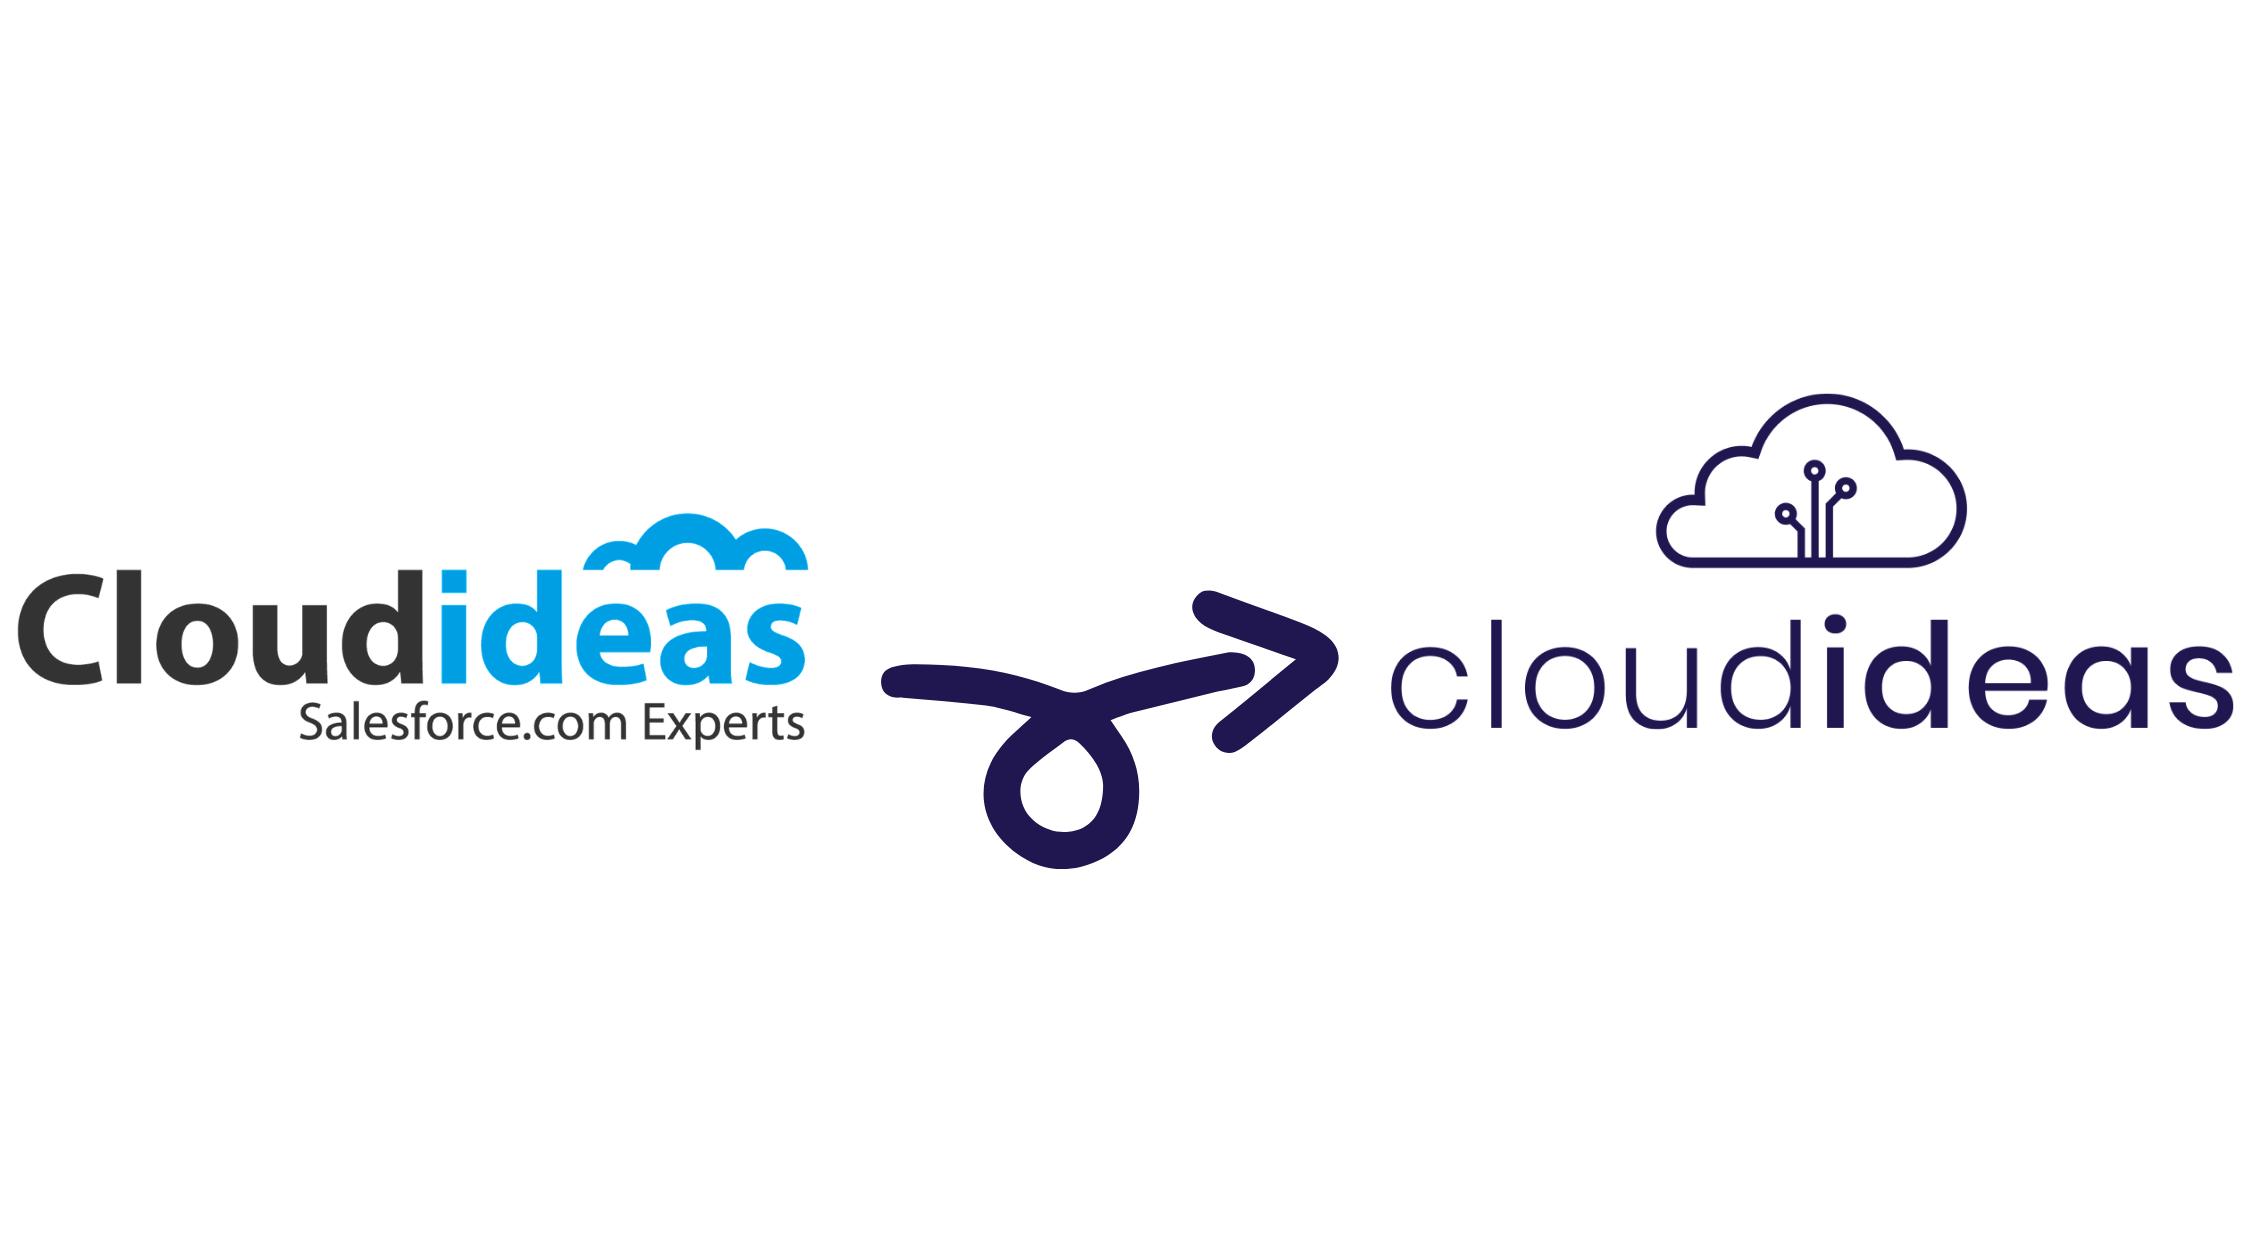 Cloudideas new logo